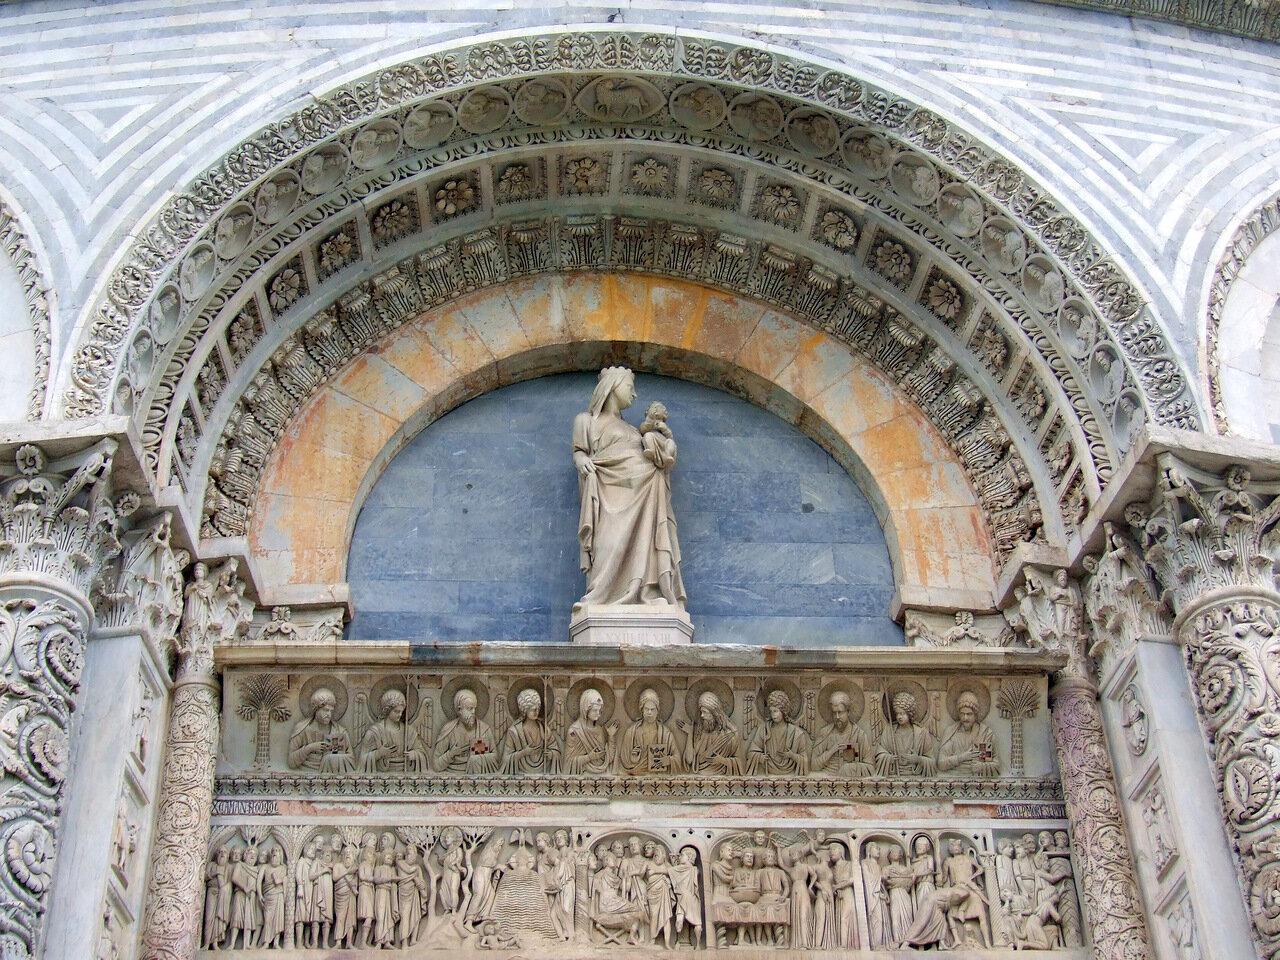 Оформление входного портала в Баптистерий (Battistero di San Giovanni)